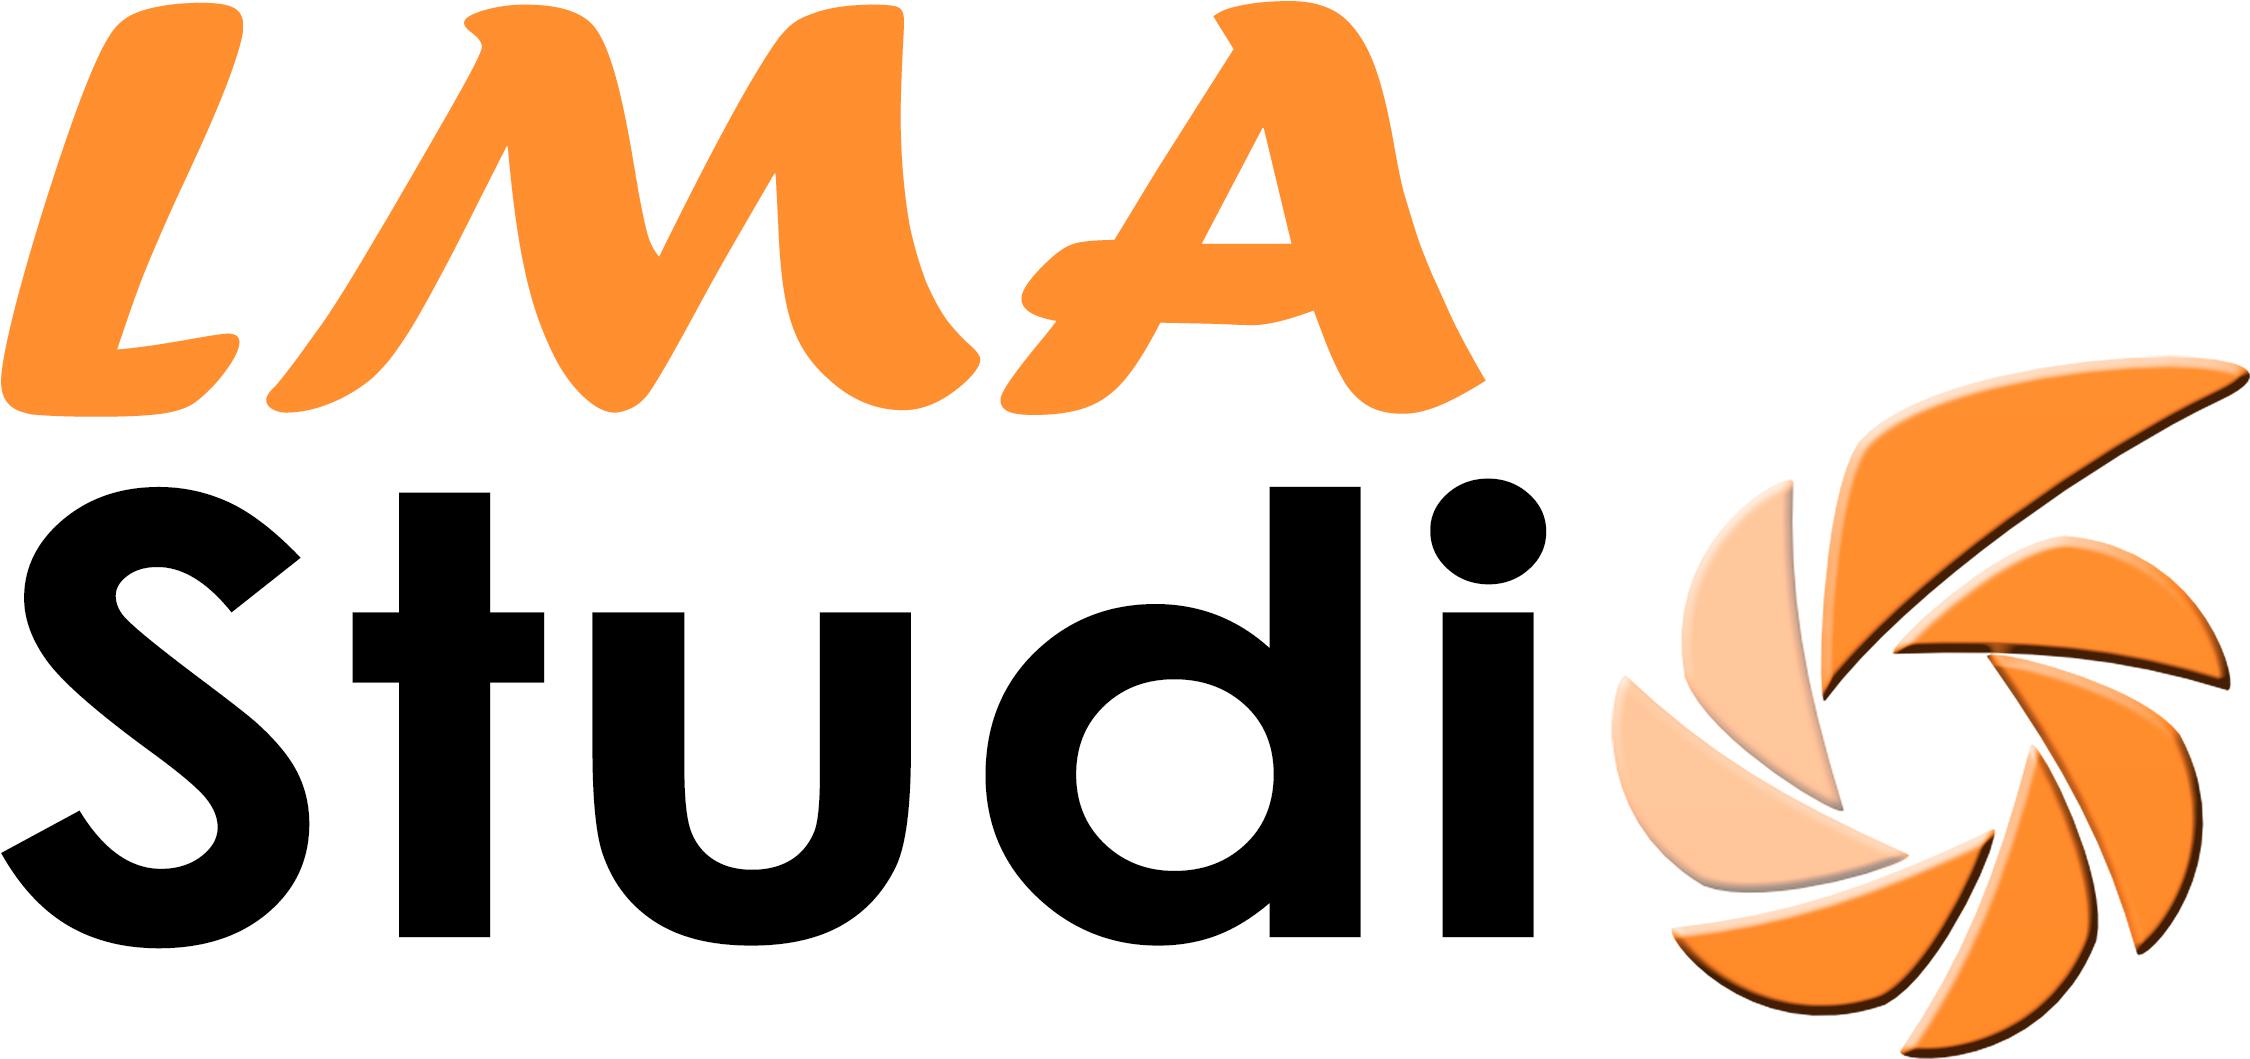 LMA Studio